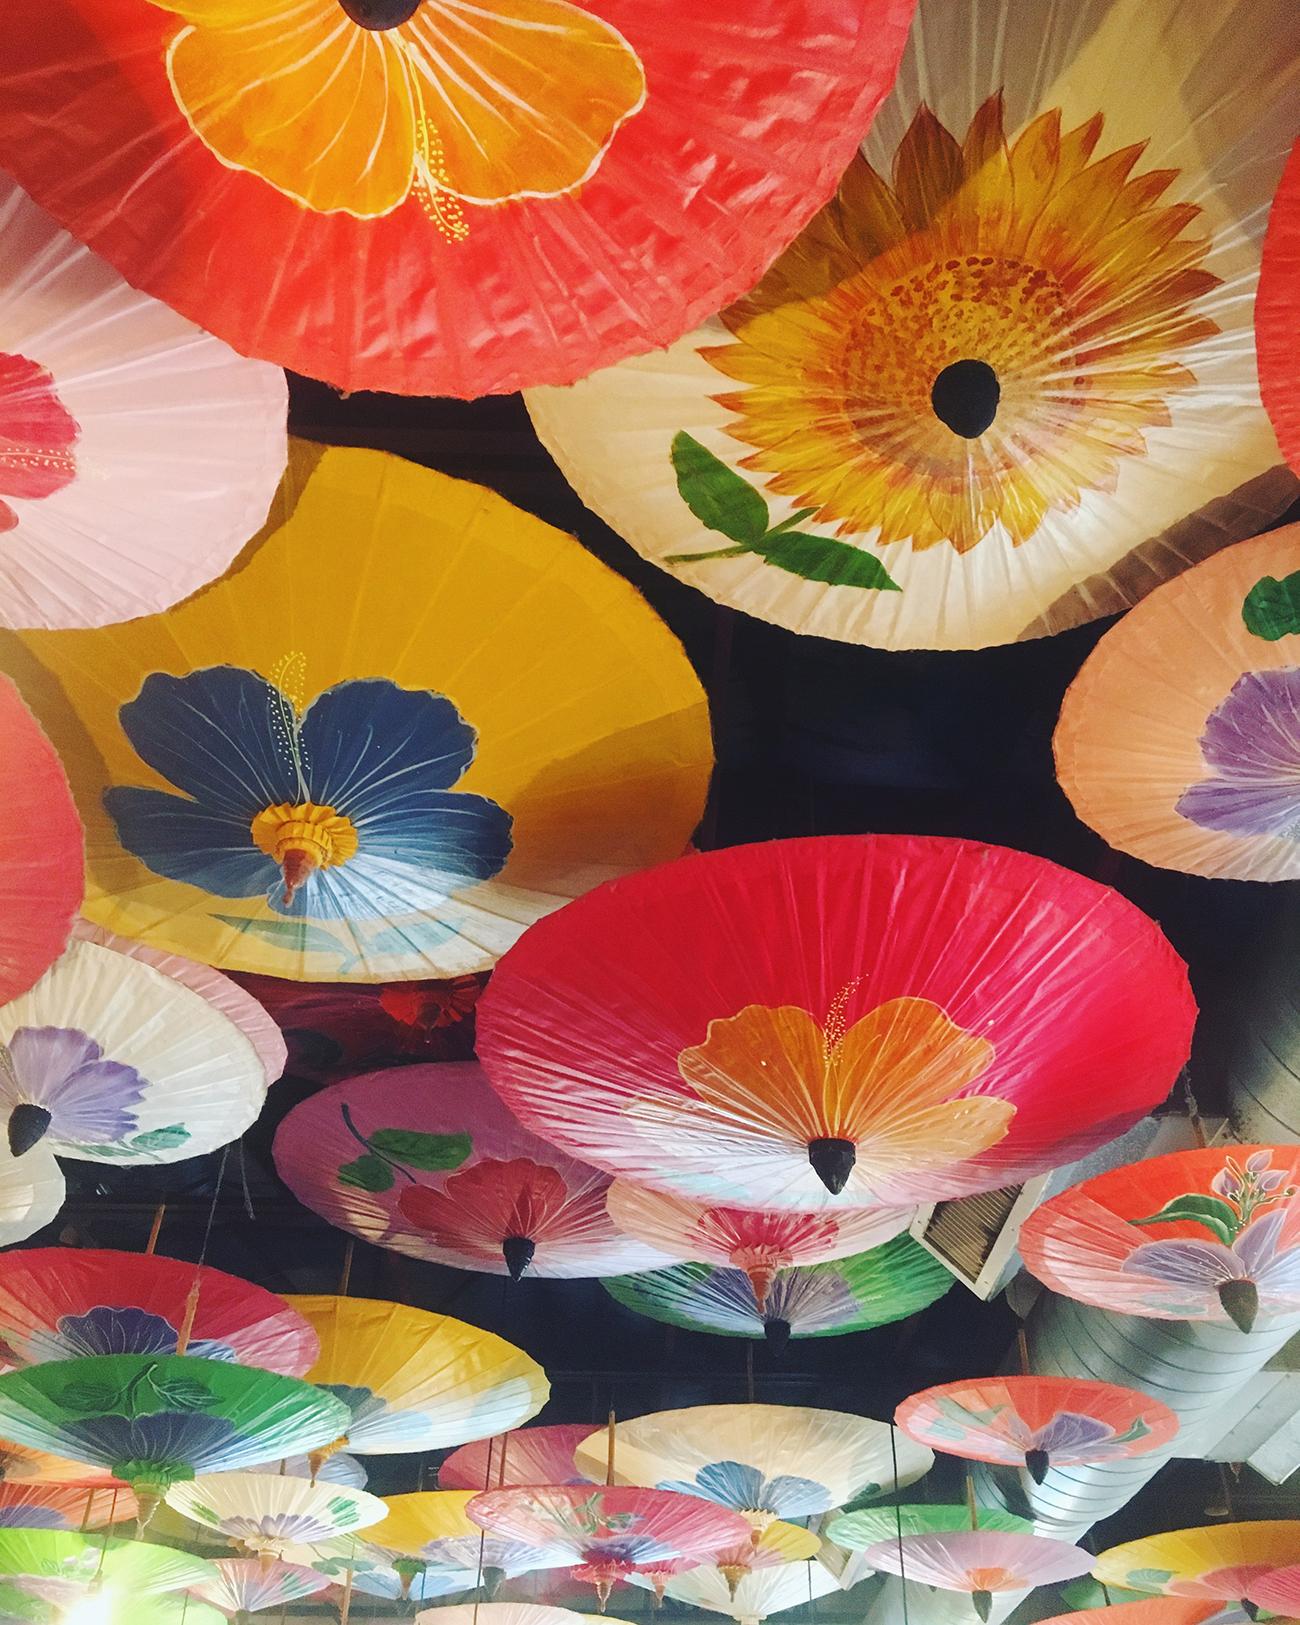 umbrellas-darcy-wheeler.jpg